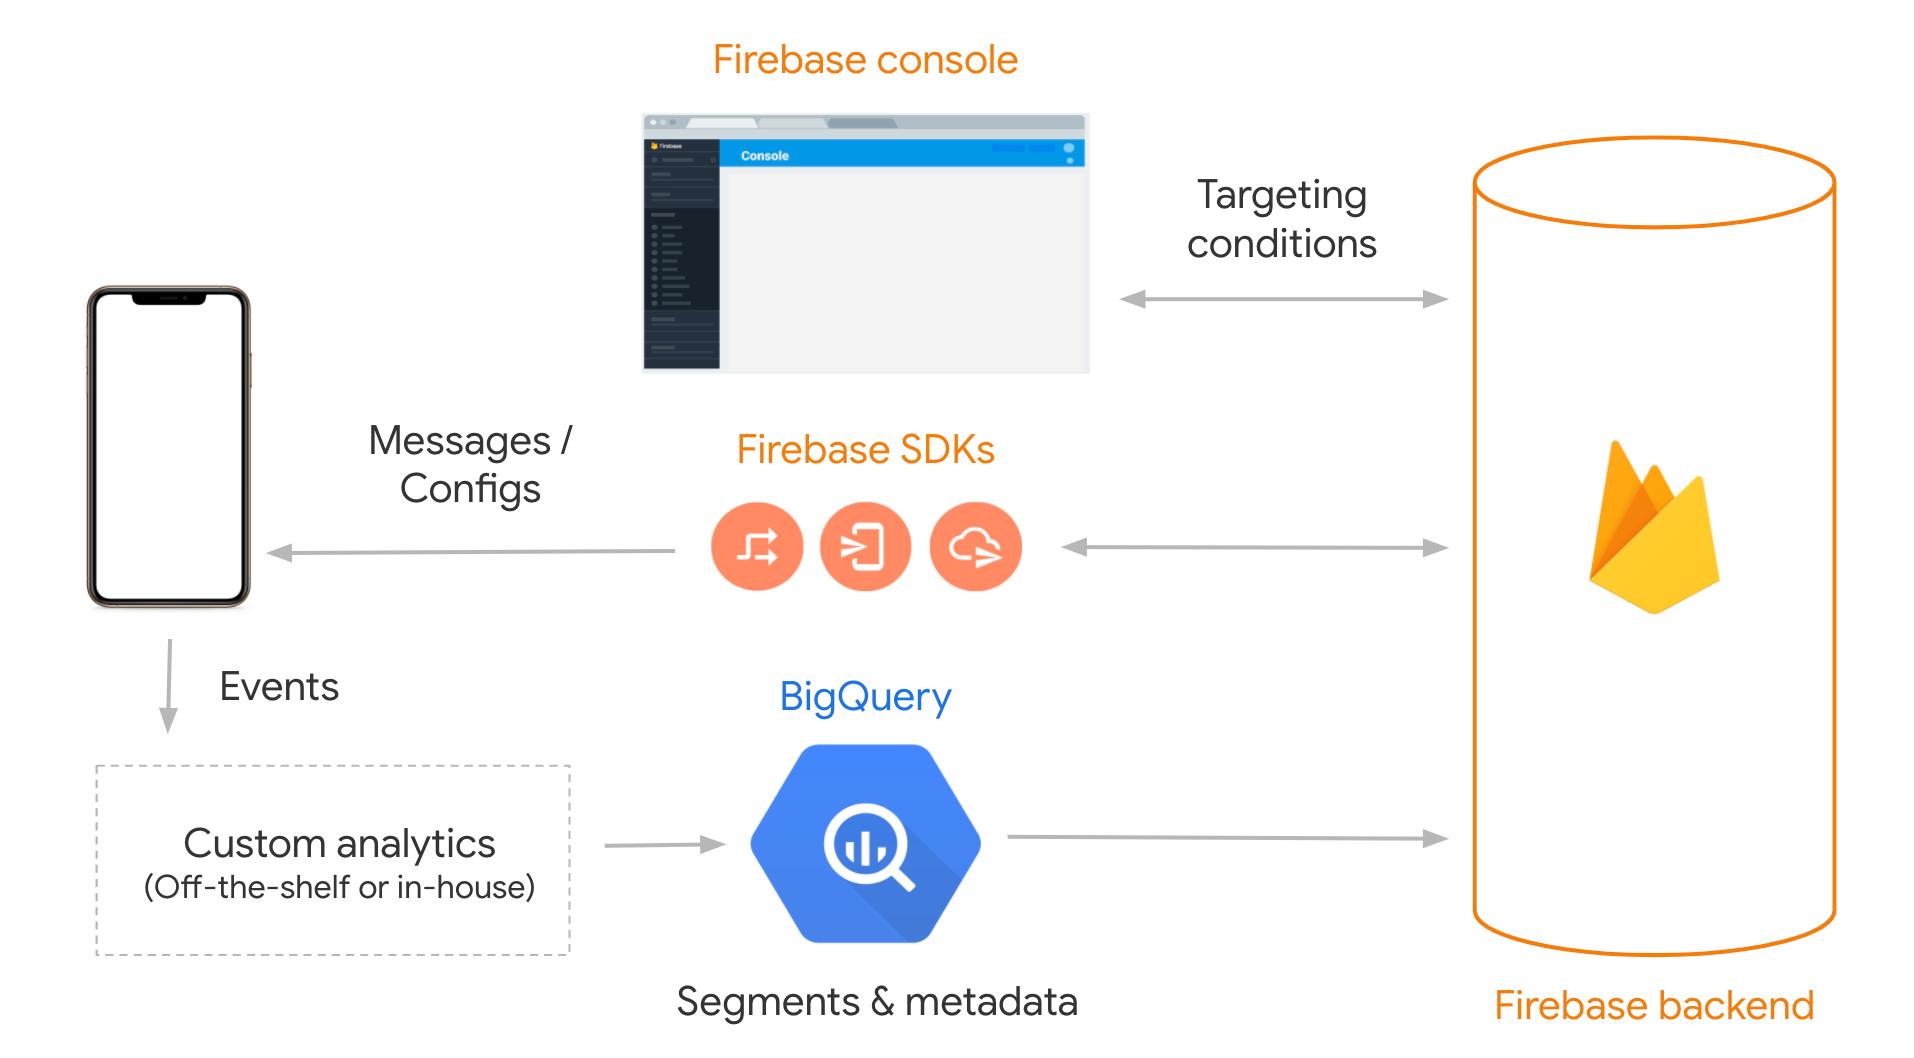 Imported segments dataflow